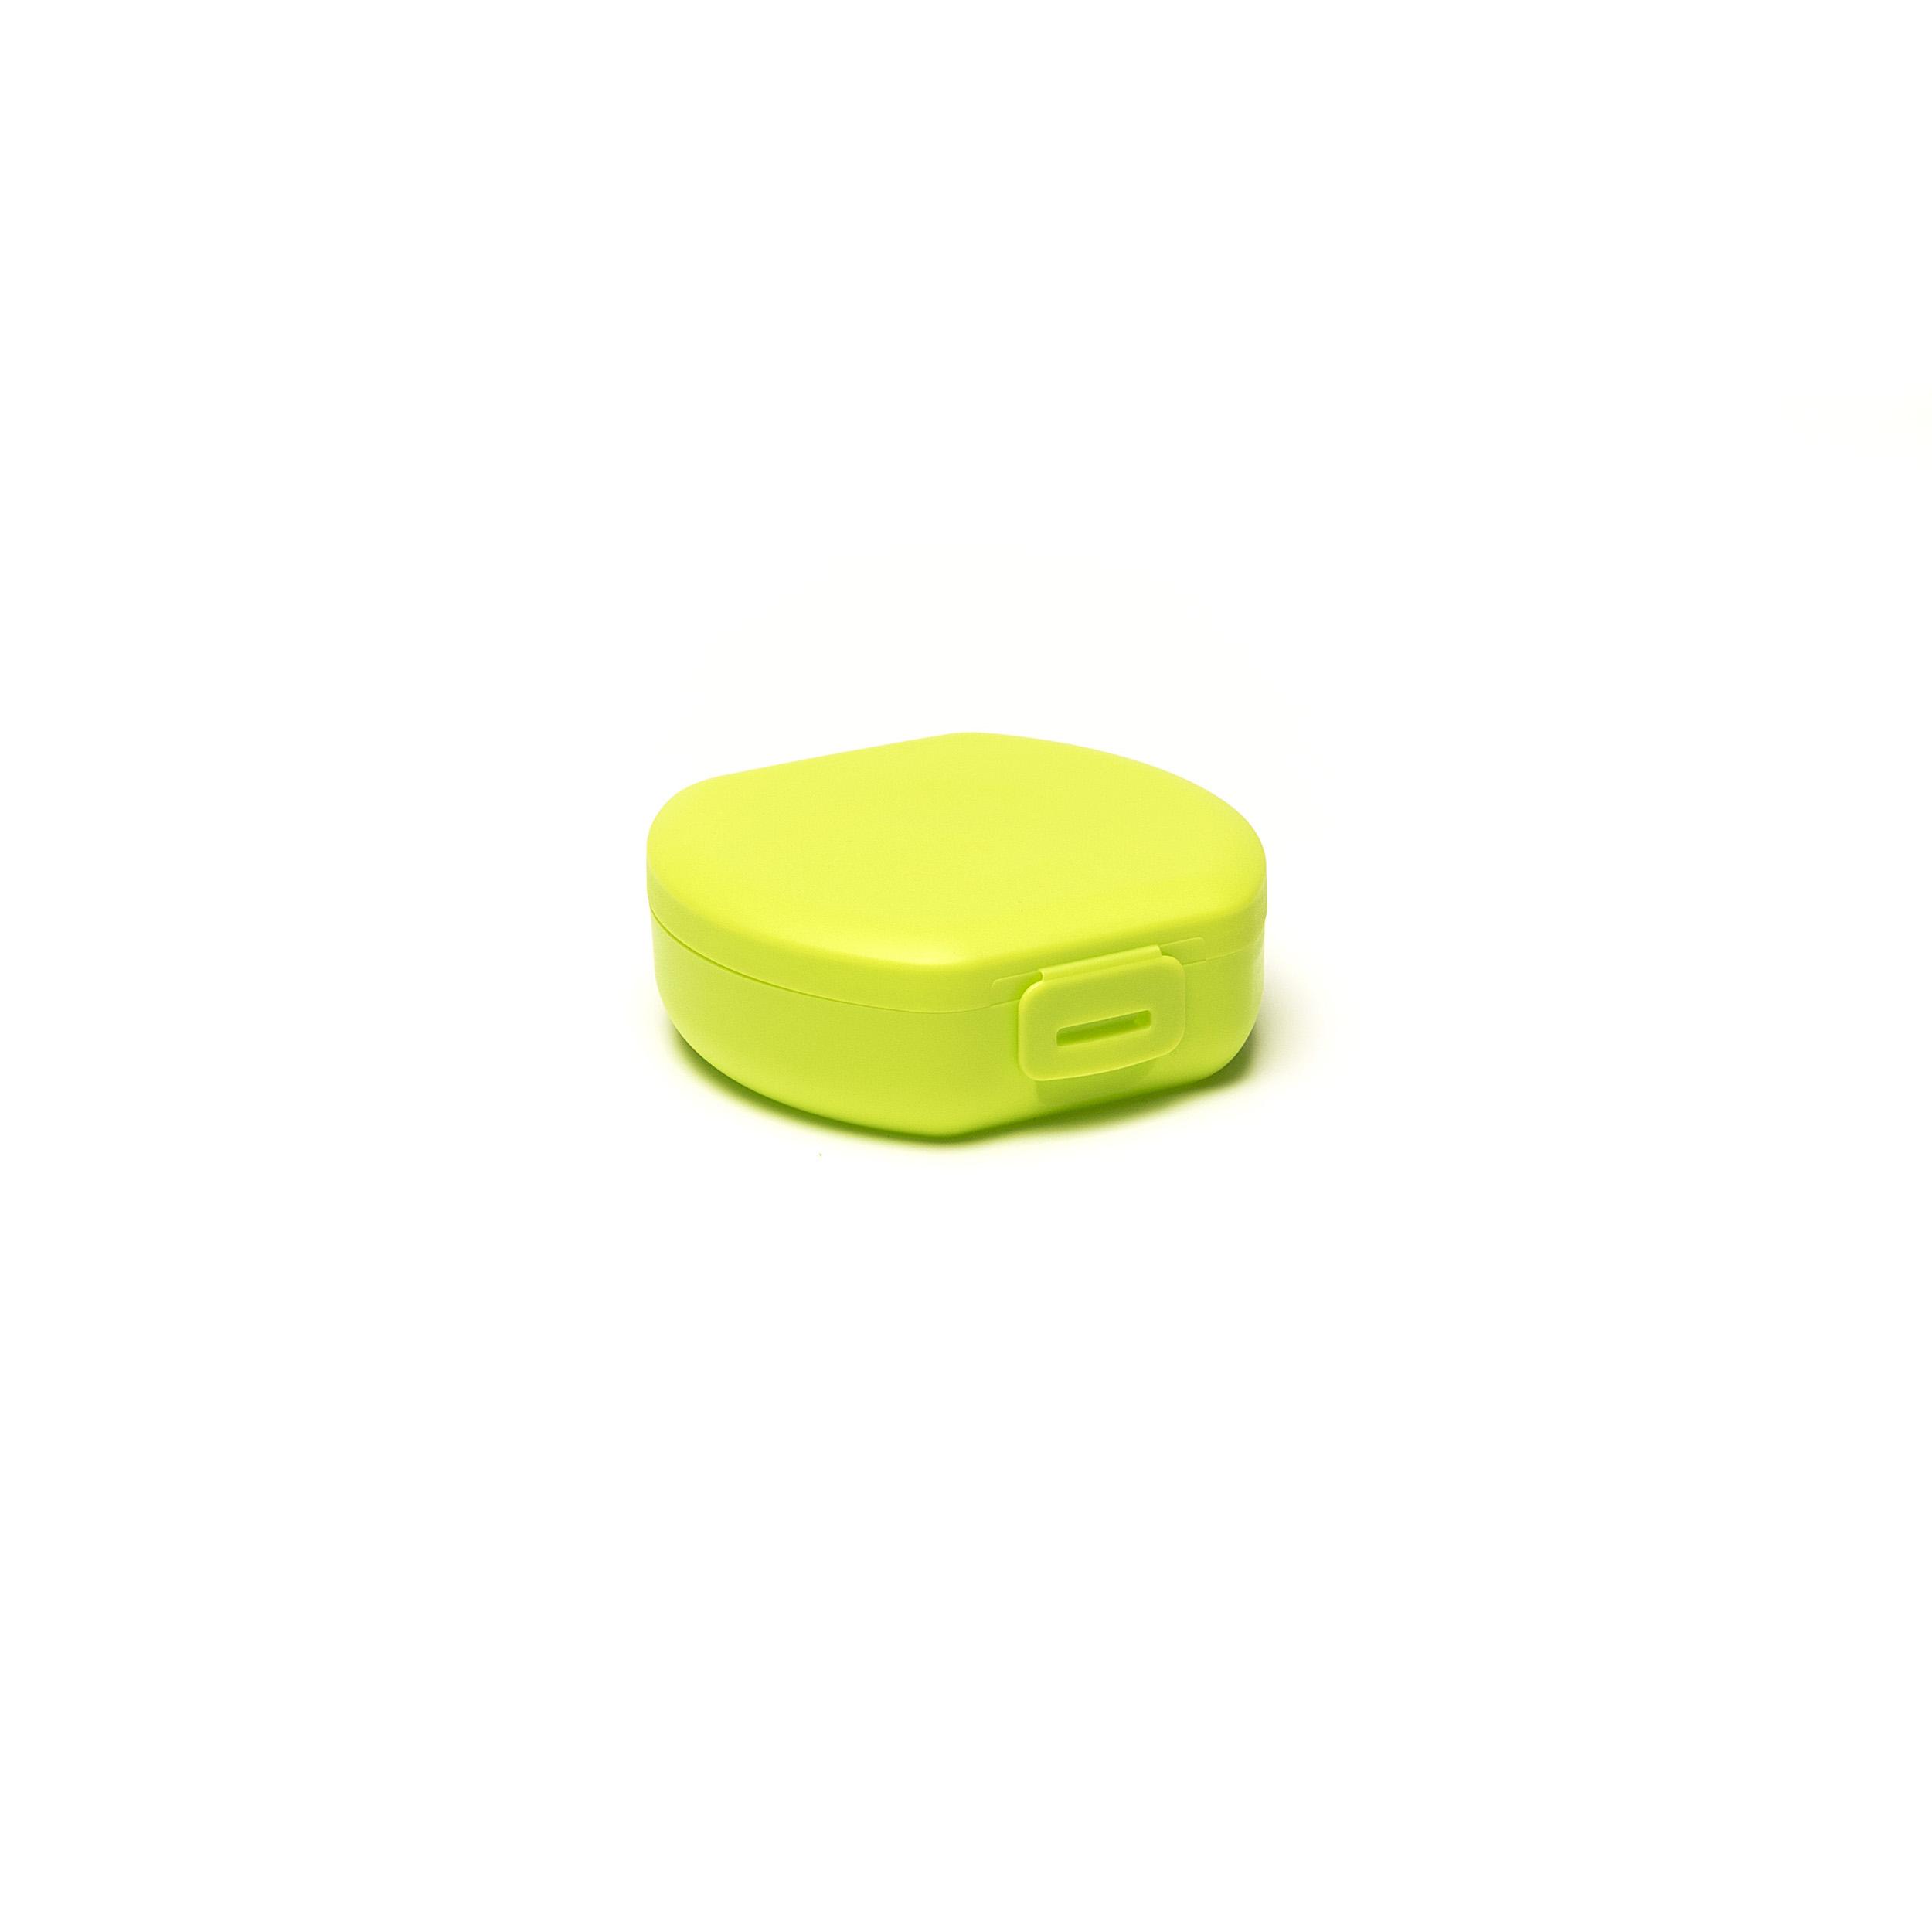 Snackbox Small Round -